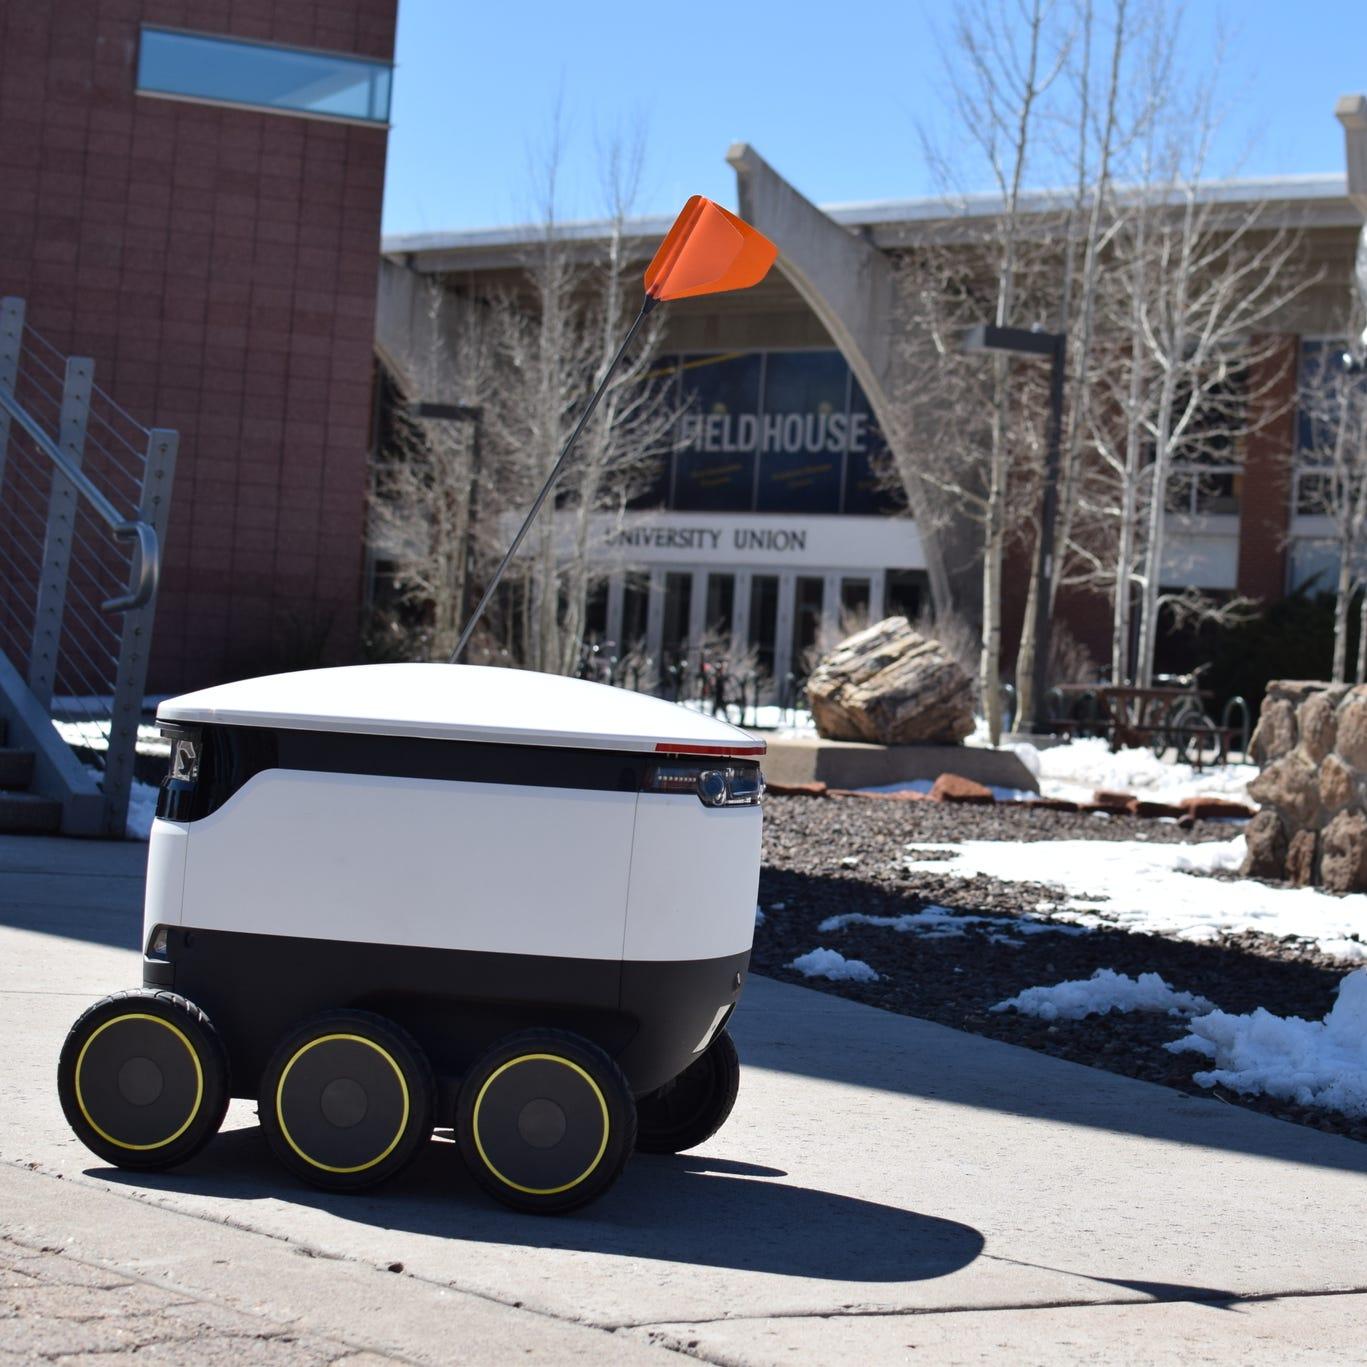 Food-delivery robots begin roaming Northern Arizona University's campus in Flagstaff